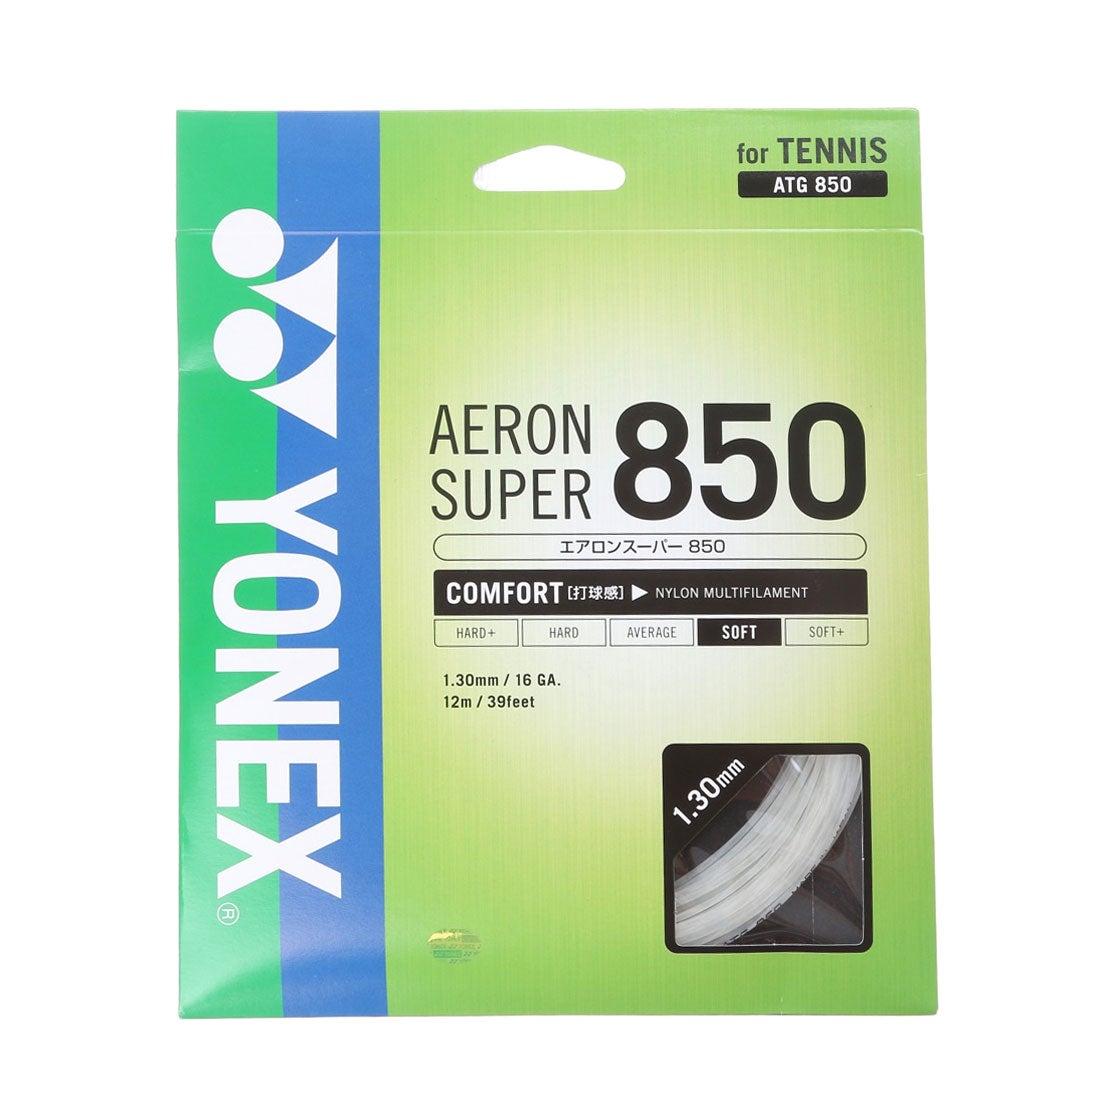 f295e0f4cb7172 ヨネックス YONEX 硬式テニスストリング エアロンスーパー850 ATG850 ホワイト (ホワイト) -レディースファッション通販  ロコンドガールズコレクション (LOCONDO ...